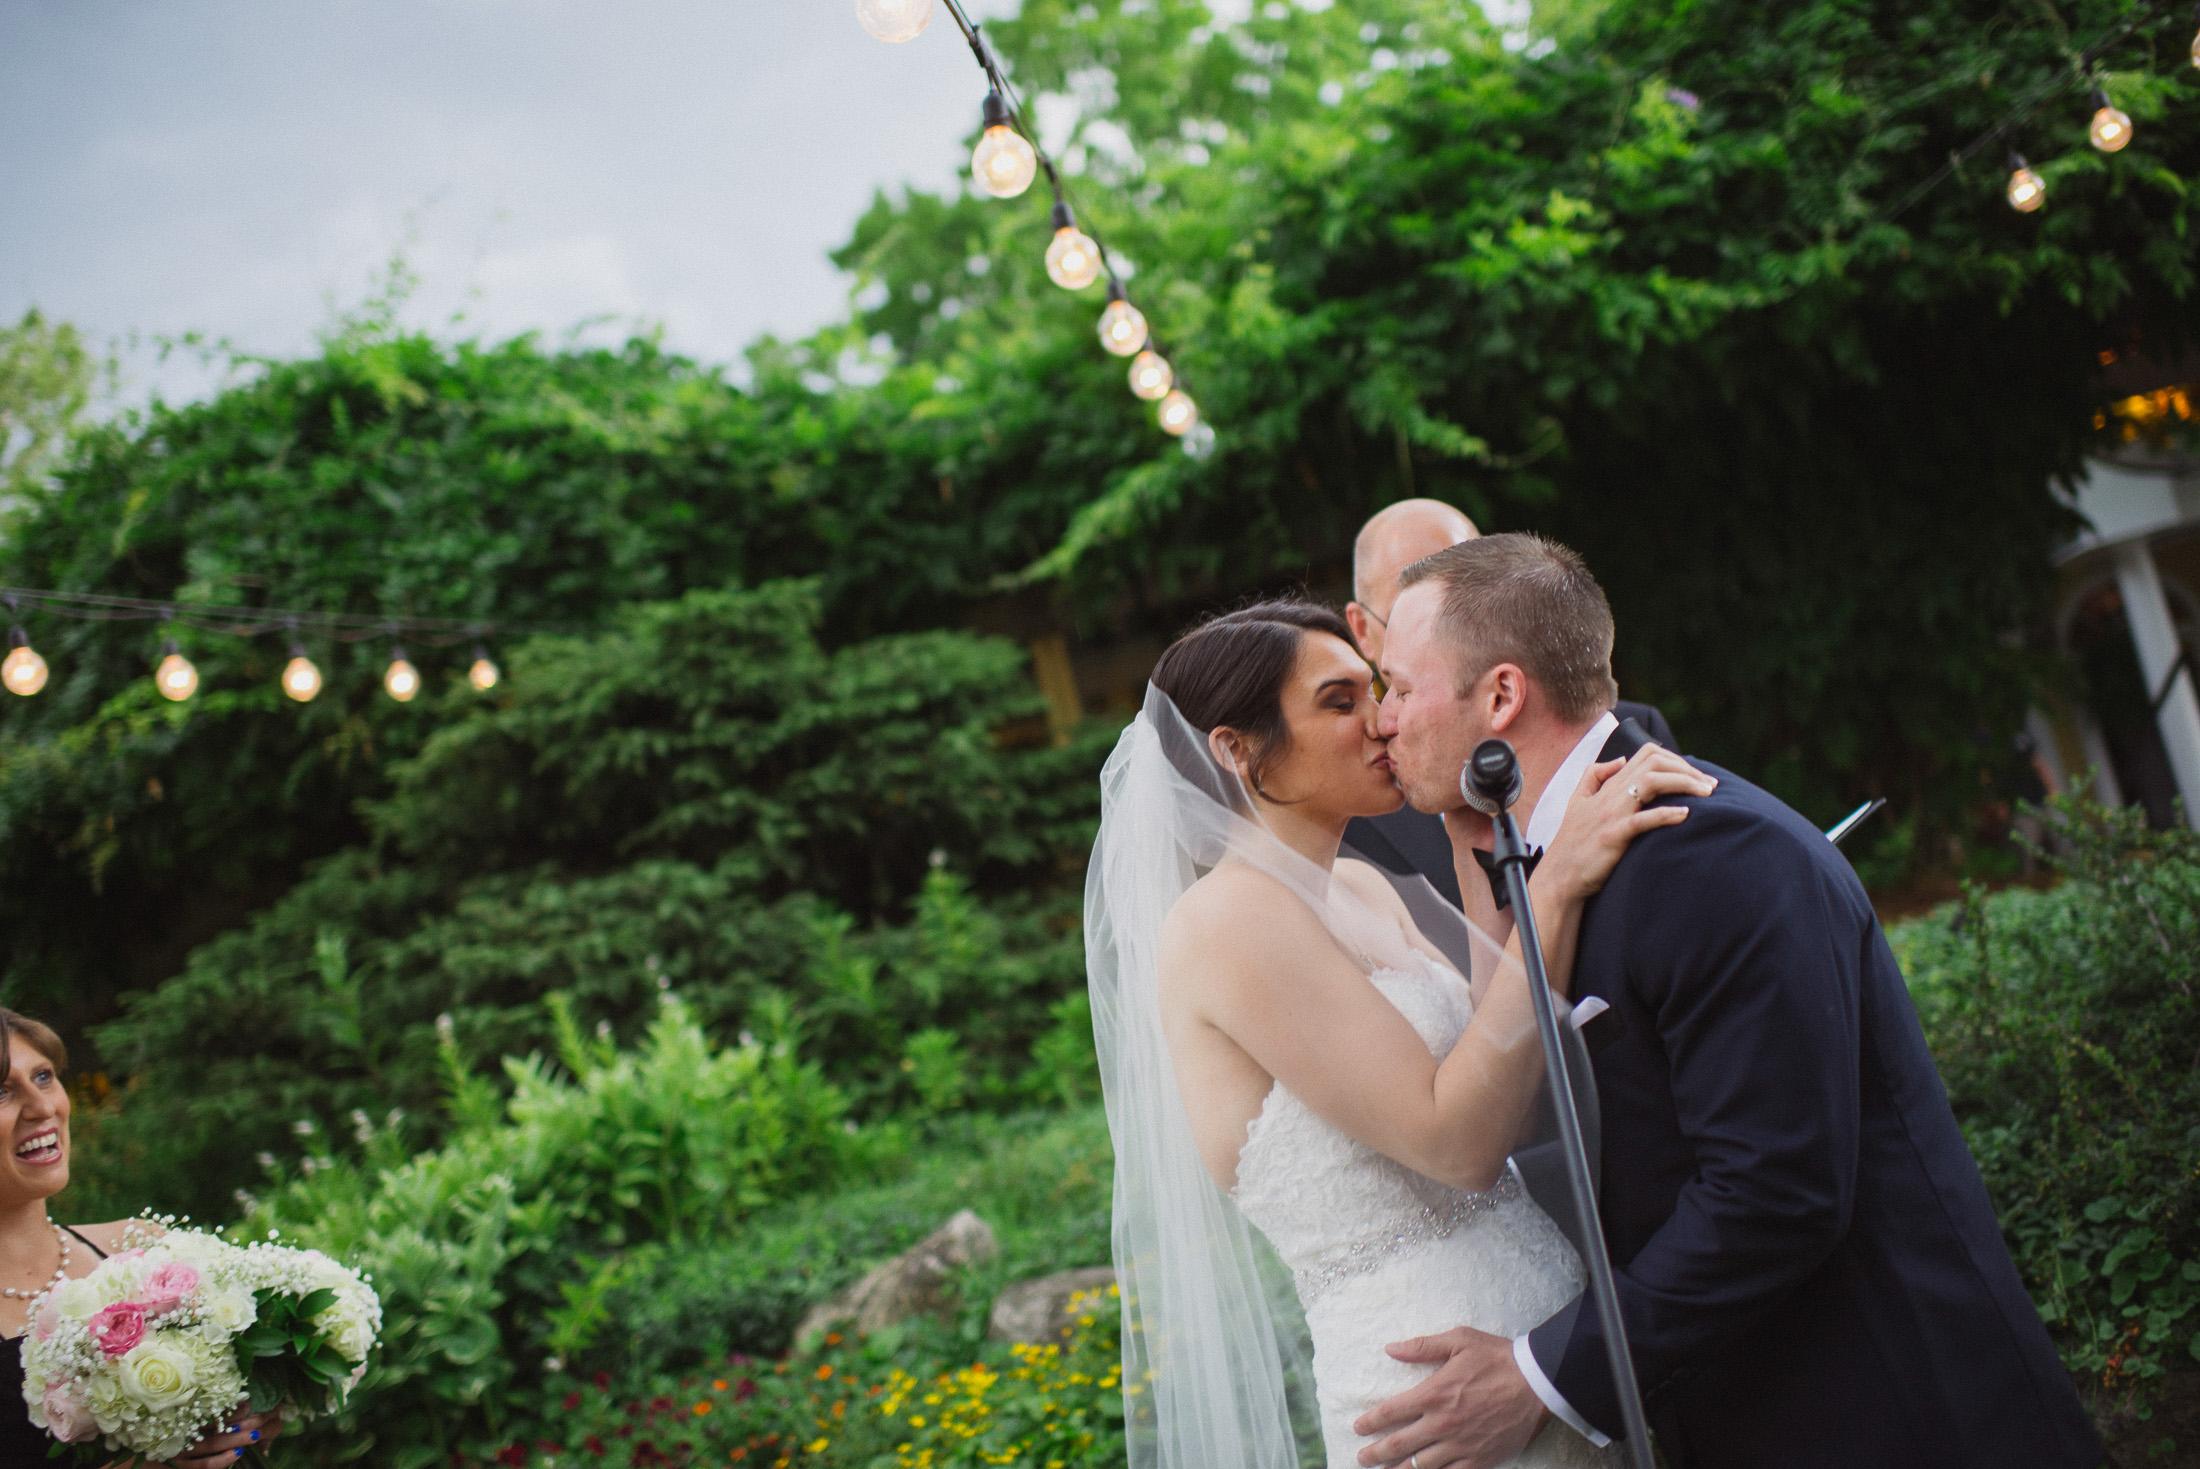 NH Wedding Photographer: ceremony under lights Bedford